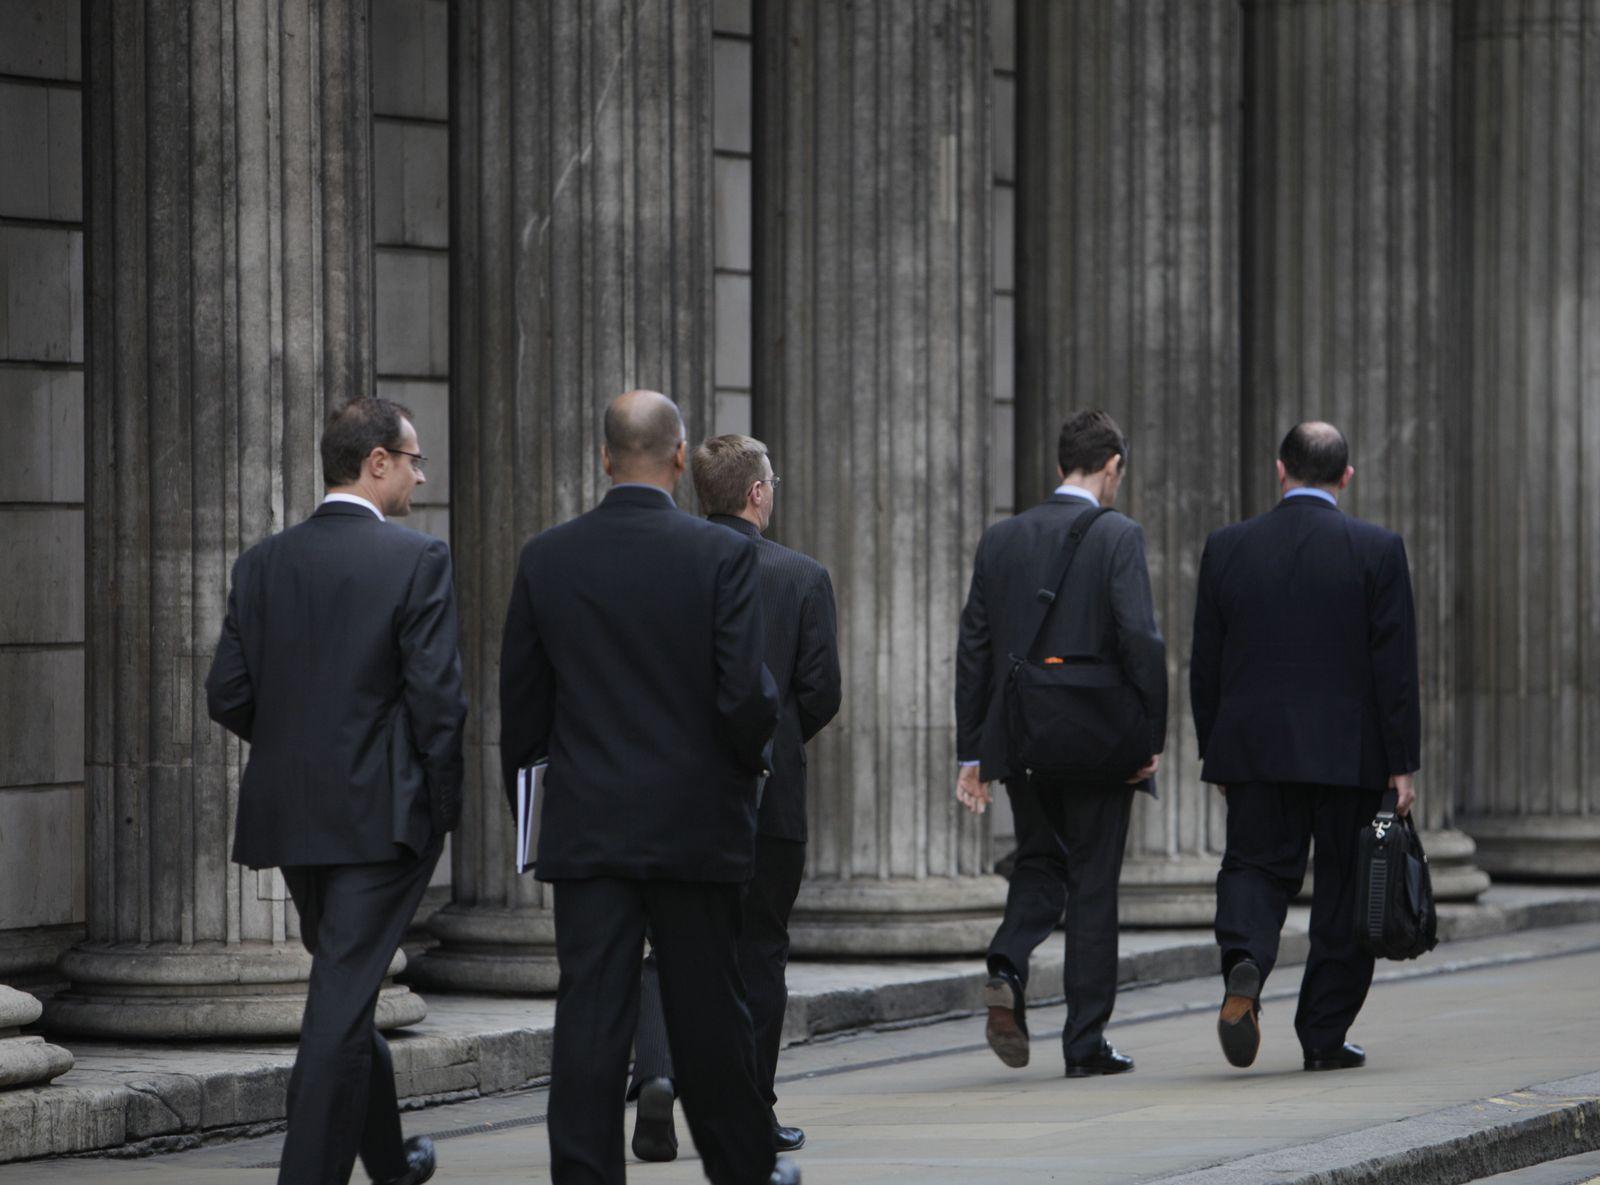 Bank of England / London